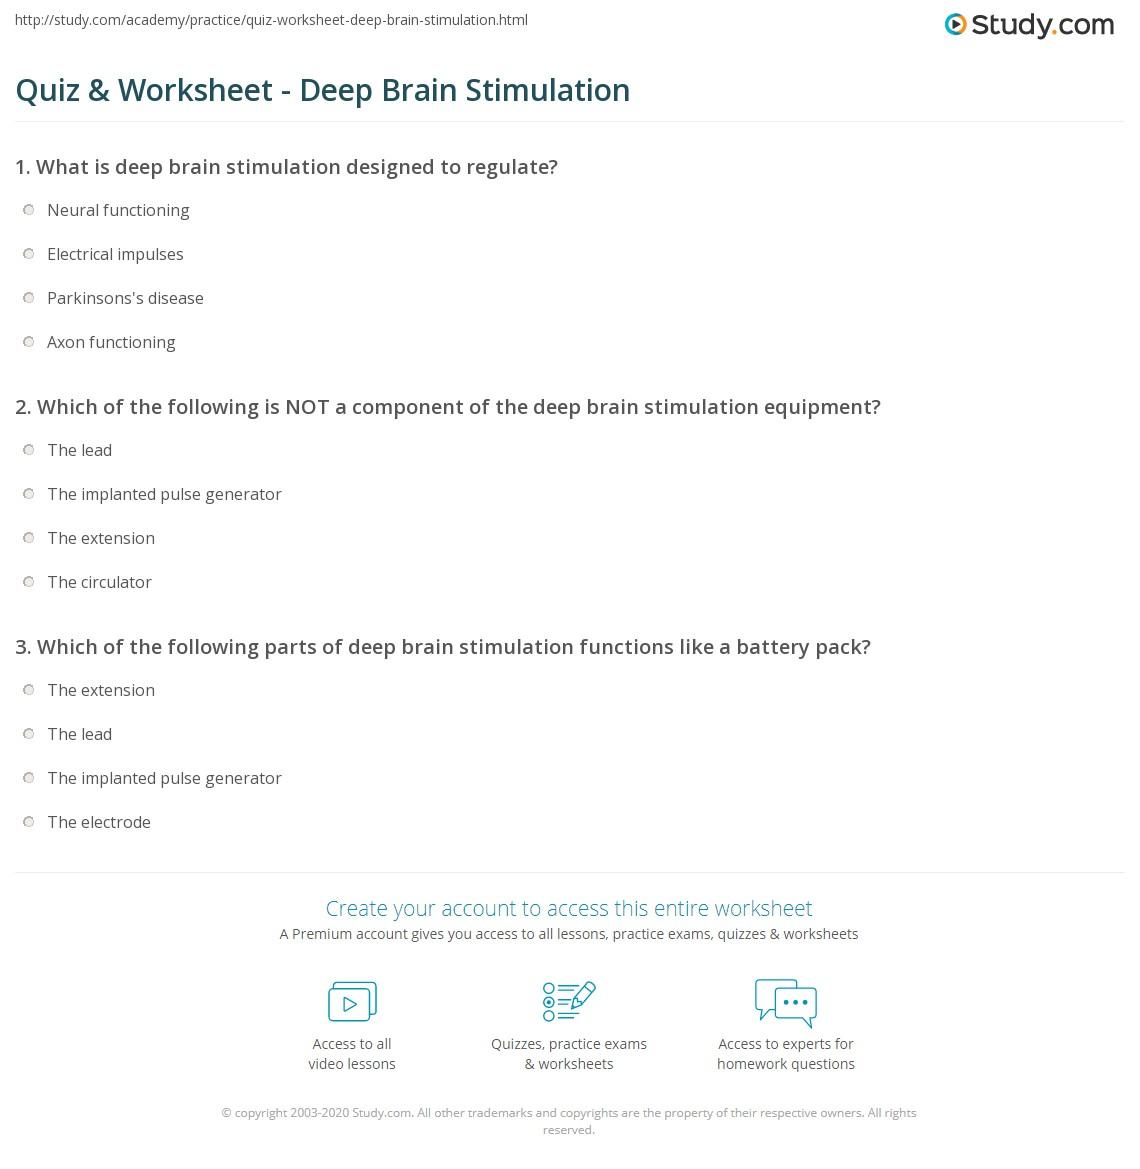 What is stimulation